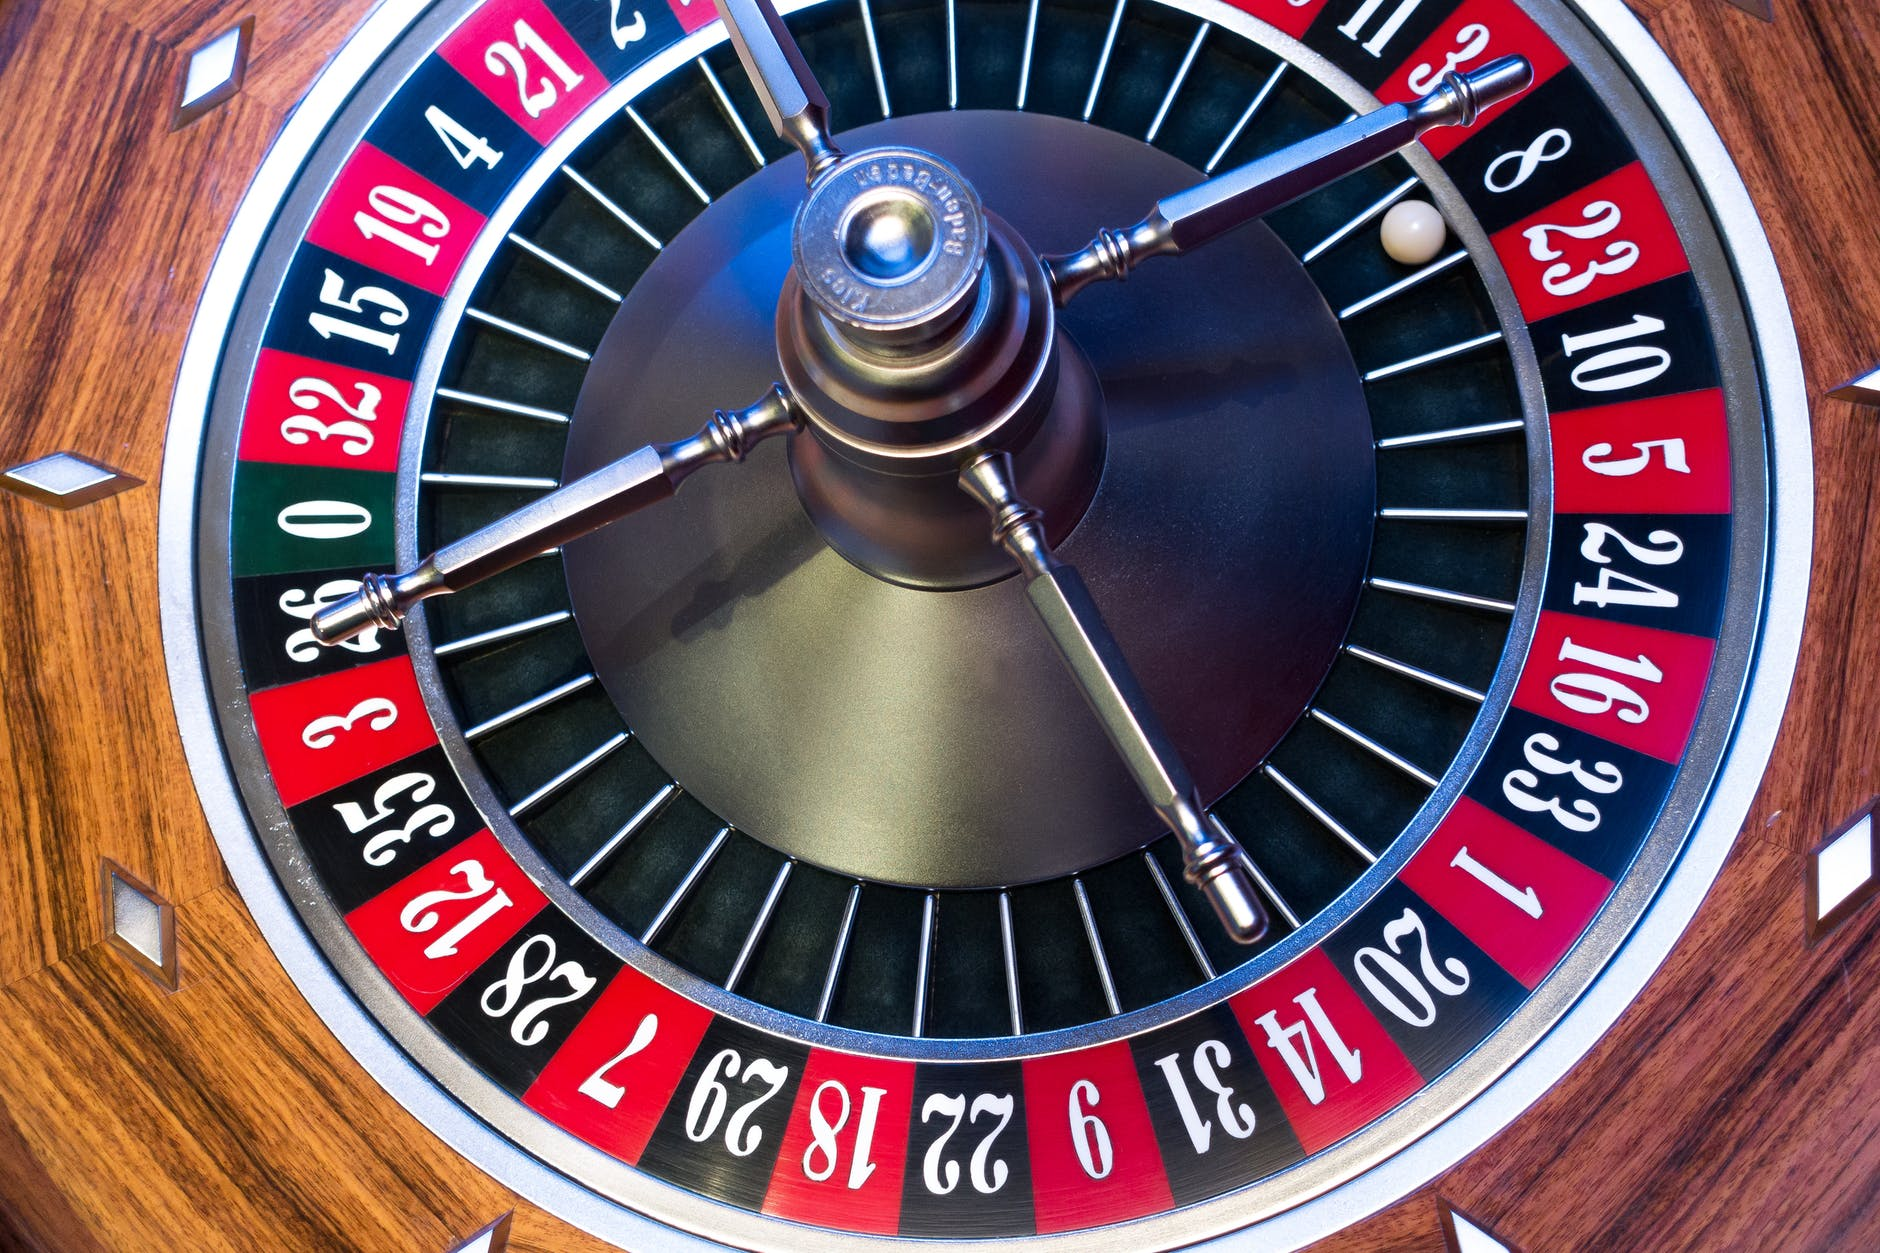 Rulet - Igra na stolu